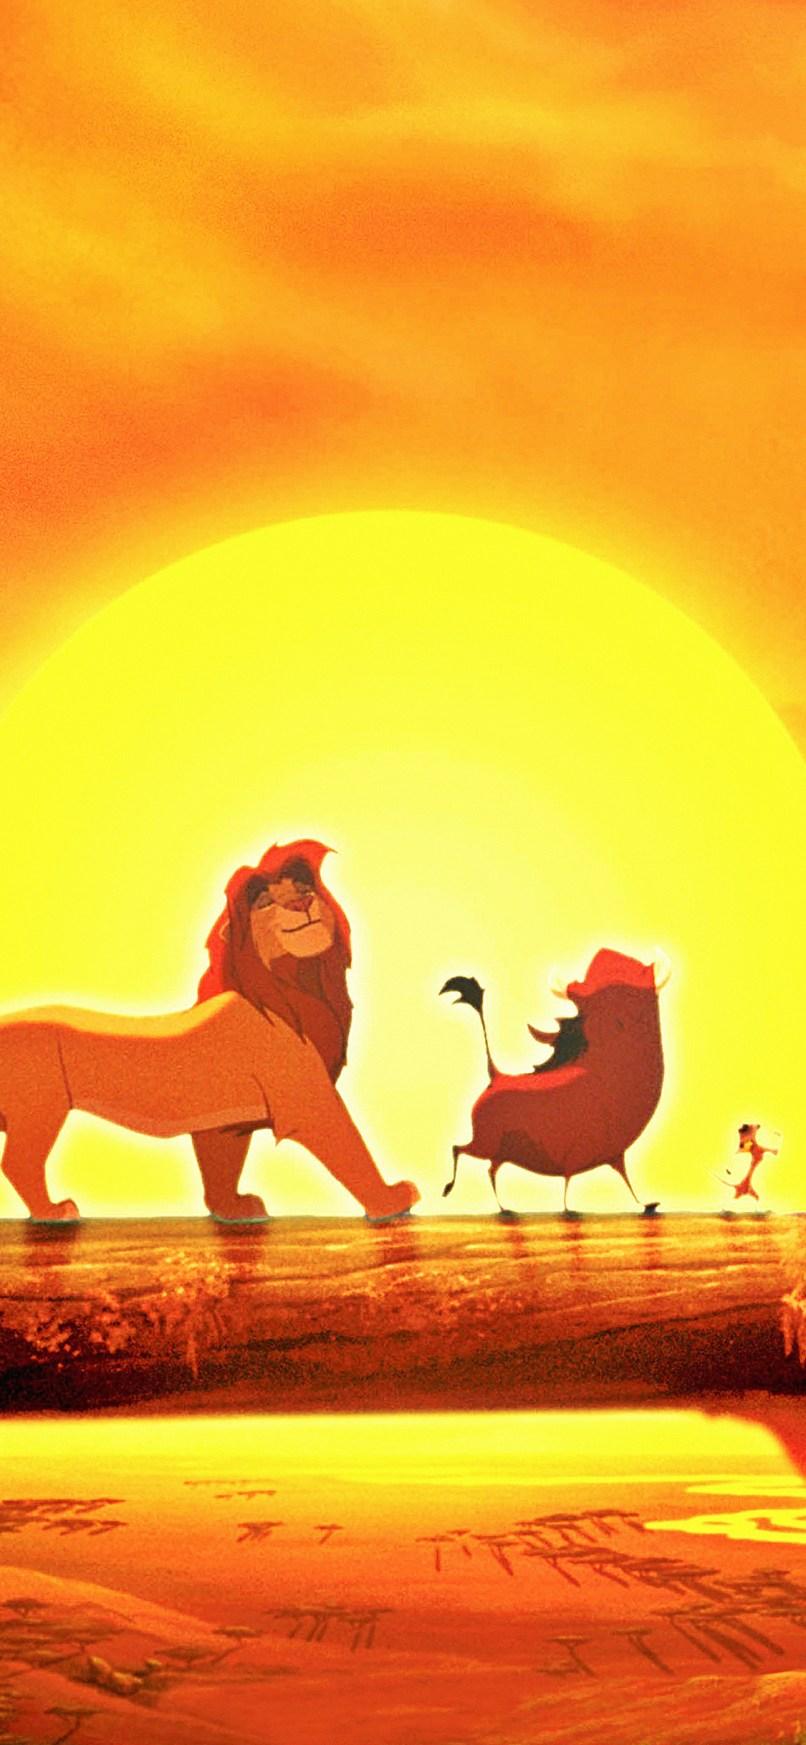 Lion King Wallpaper Iphone X Djiwallpaper Co